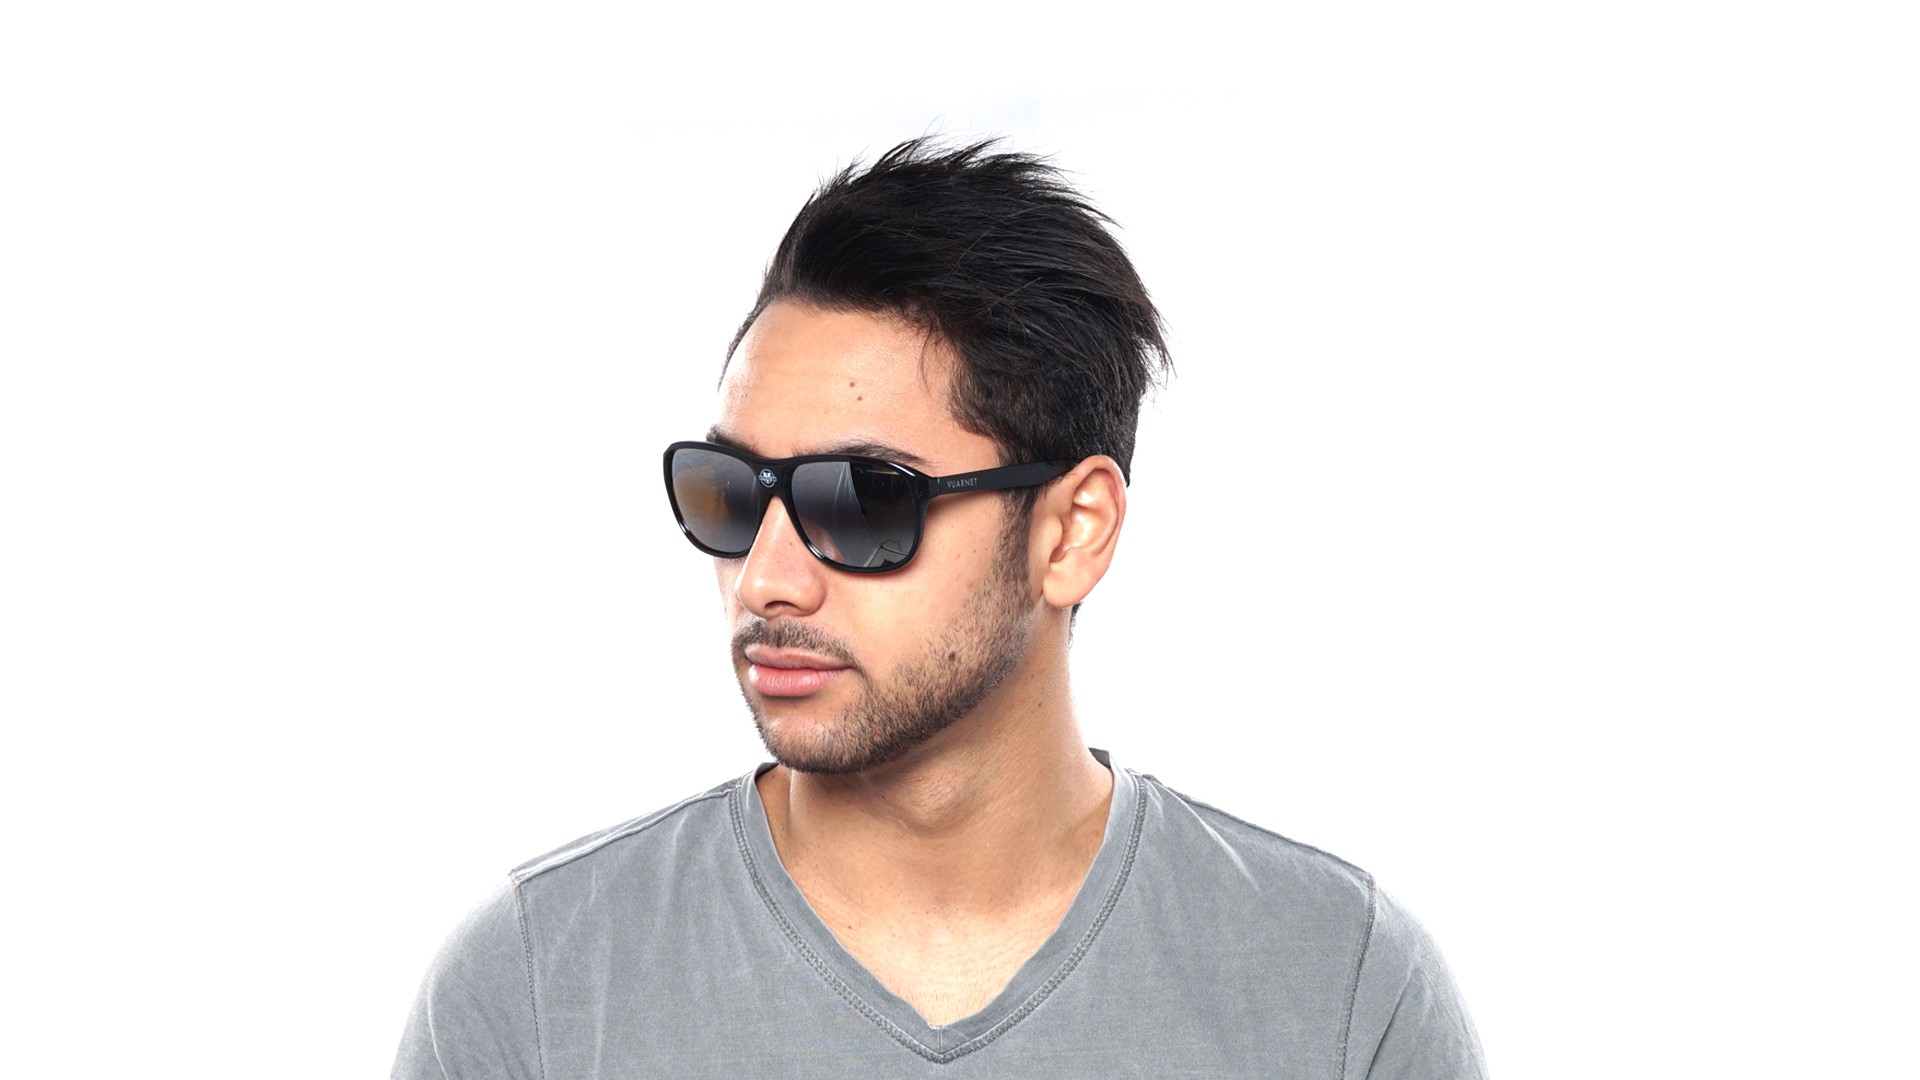 bbffcd92b2 Sunglasses Vuarnet Legends Black Skilynx VL0003 0001 56-19 Large Gradient  Mirror